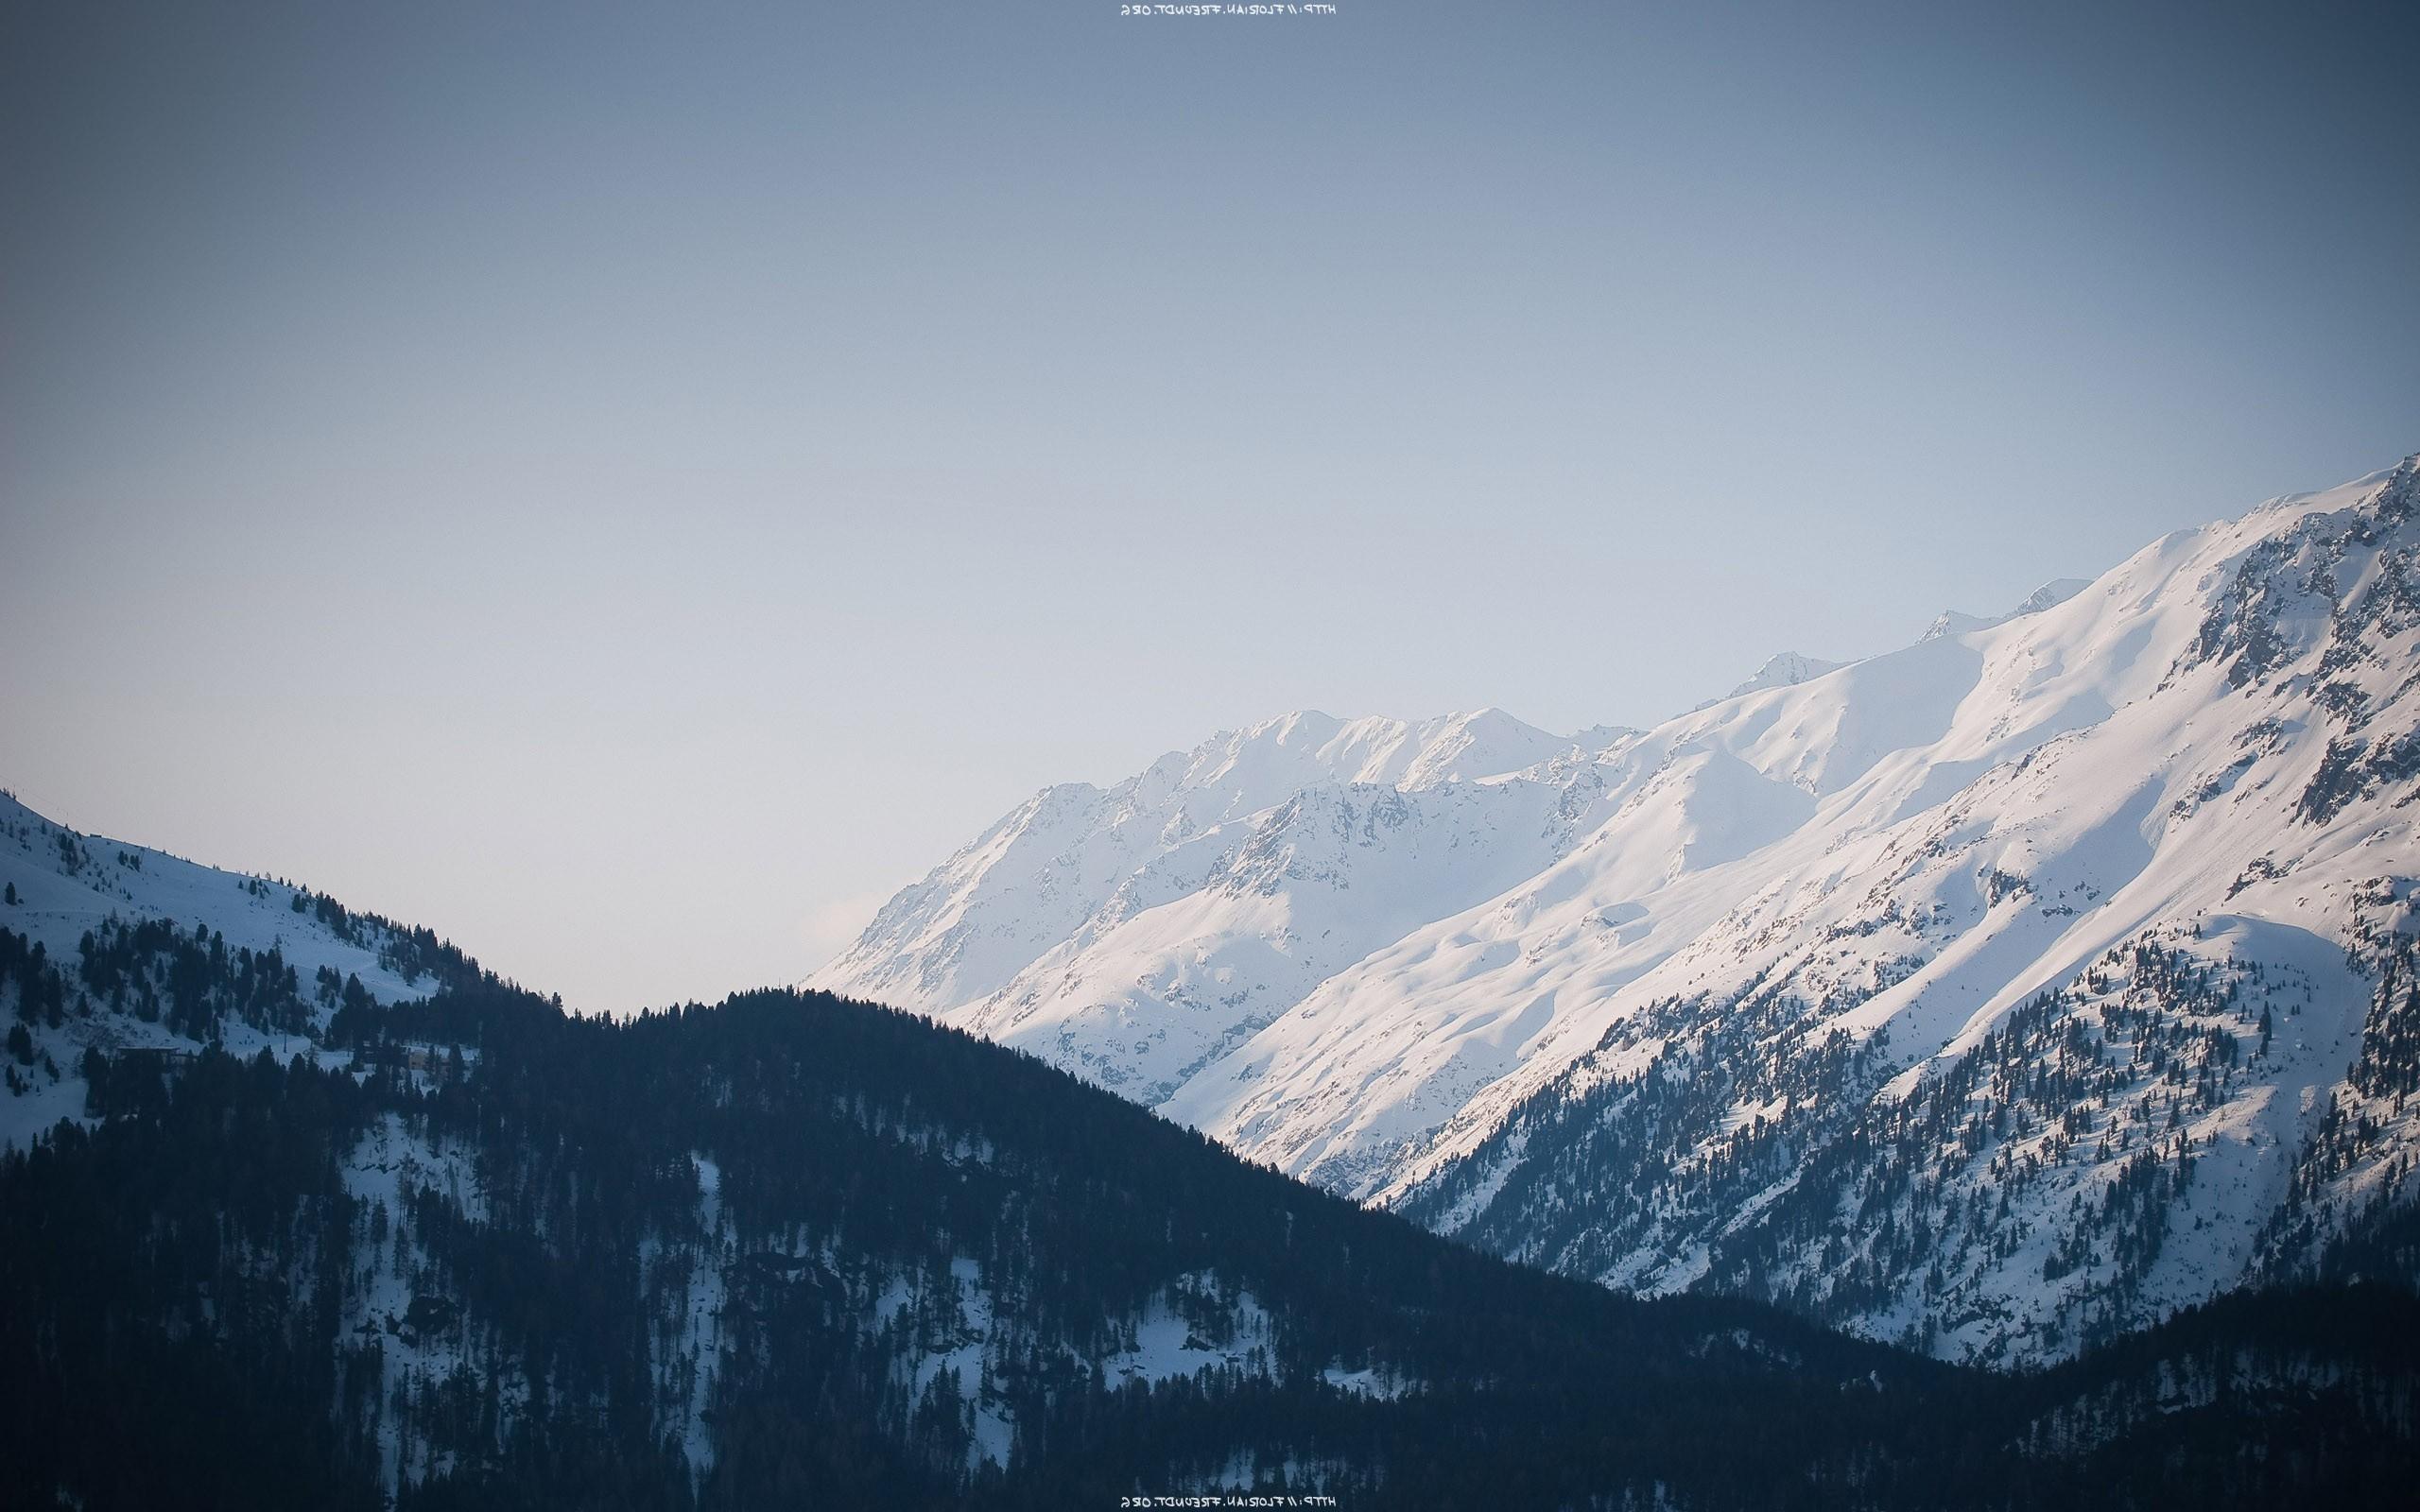 … Snowy mountain range HD Wallpaper 2560×1600